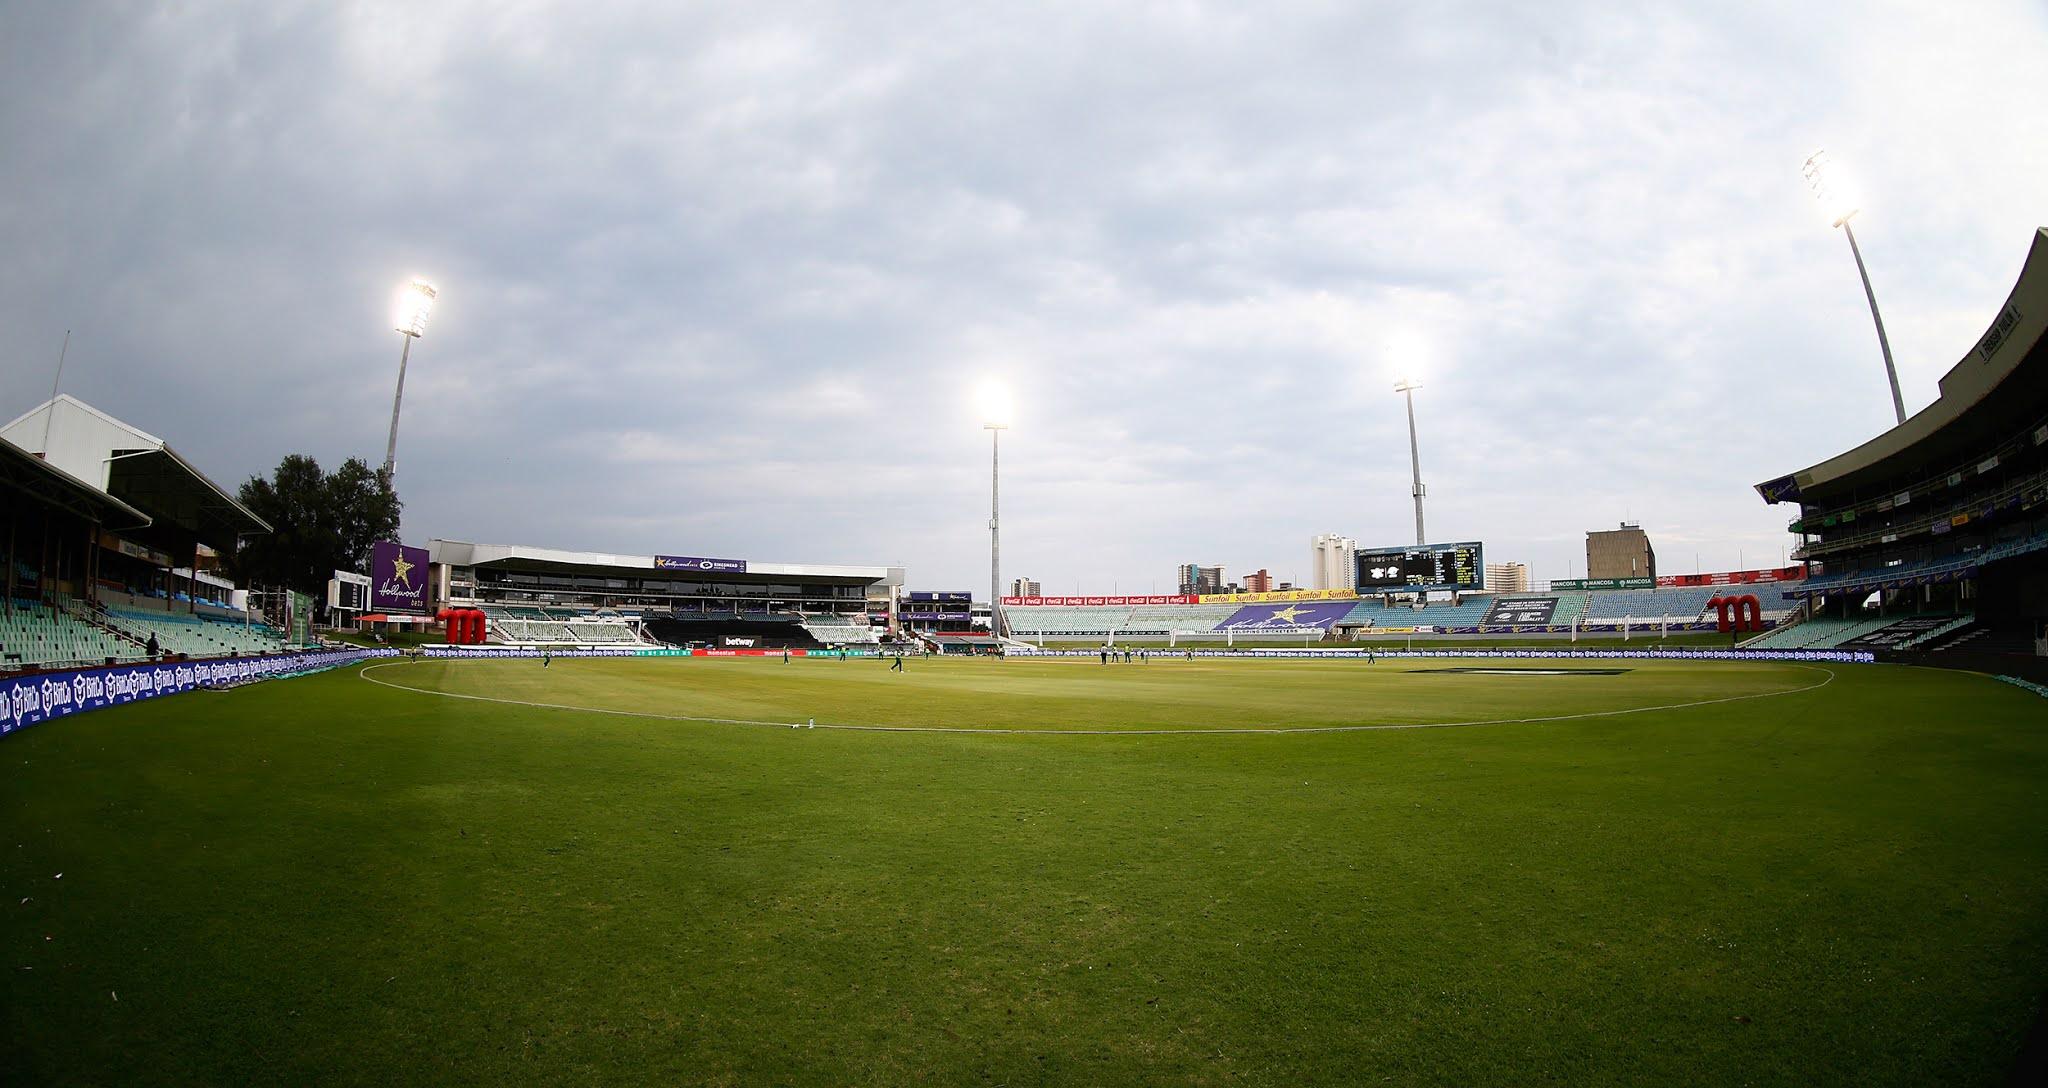 Hollywoodbets Kingsmead Stadium primed for T20 Challenge